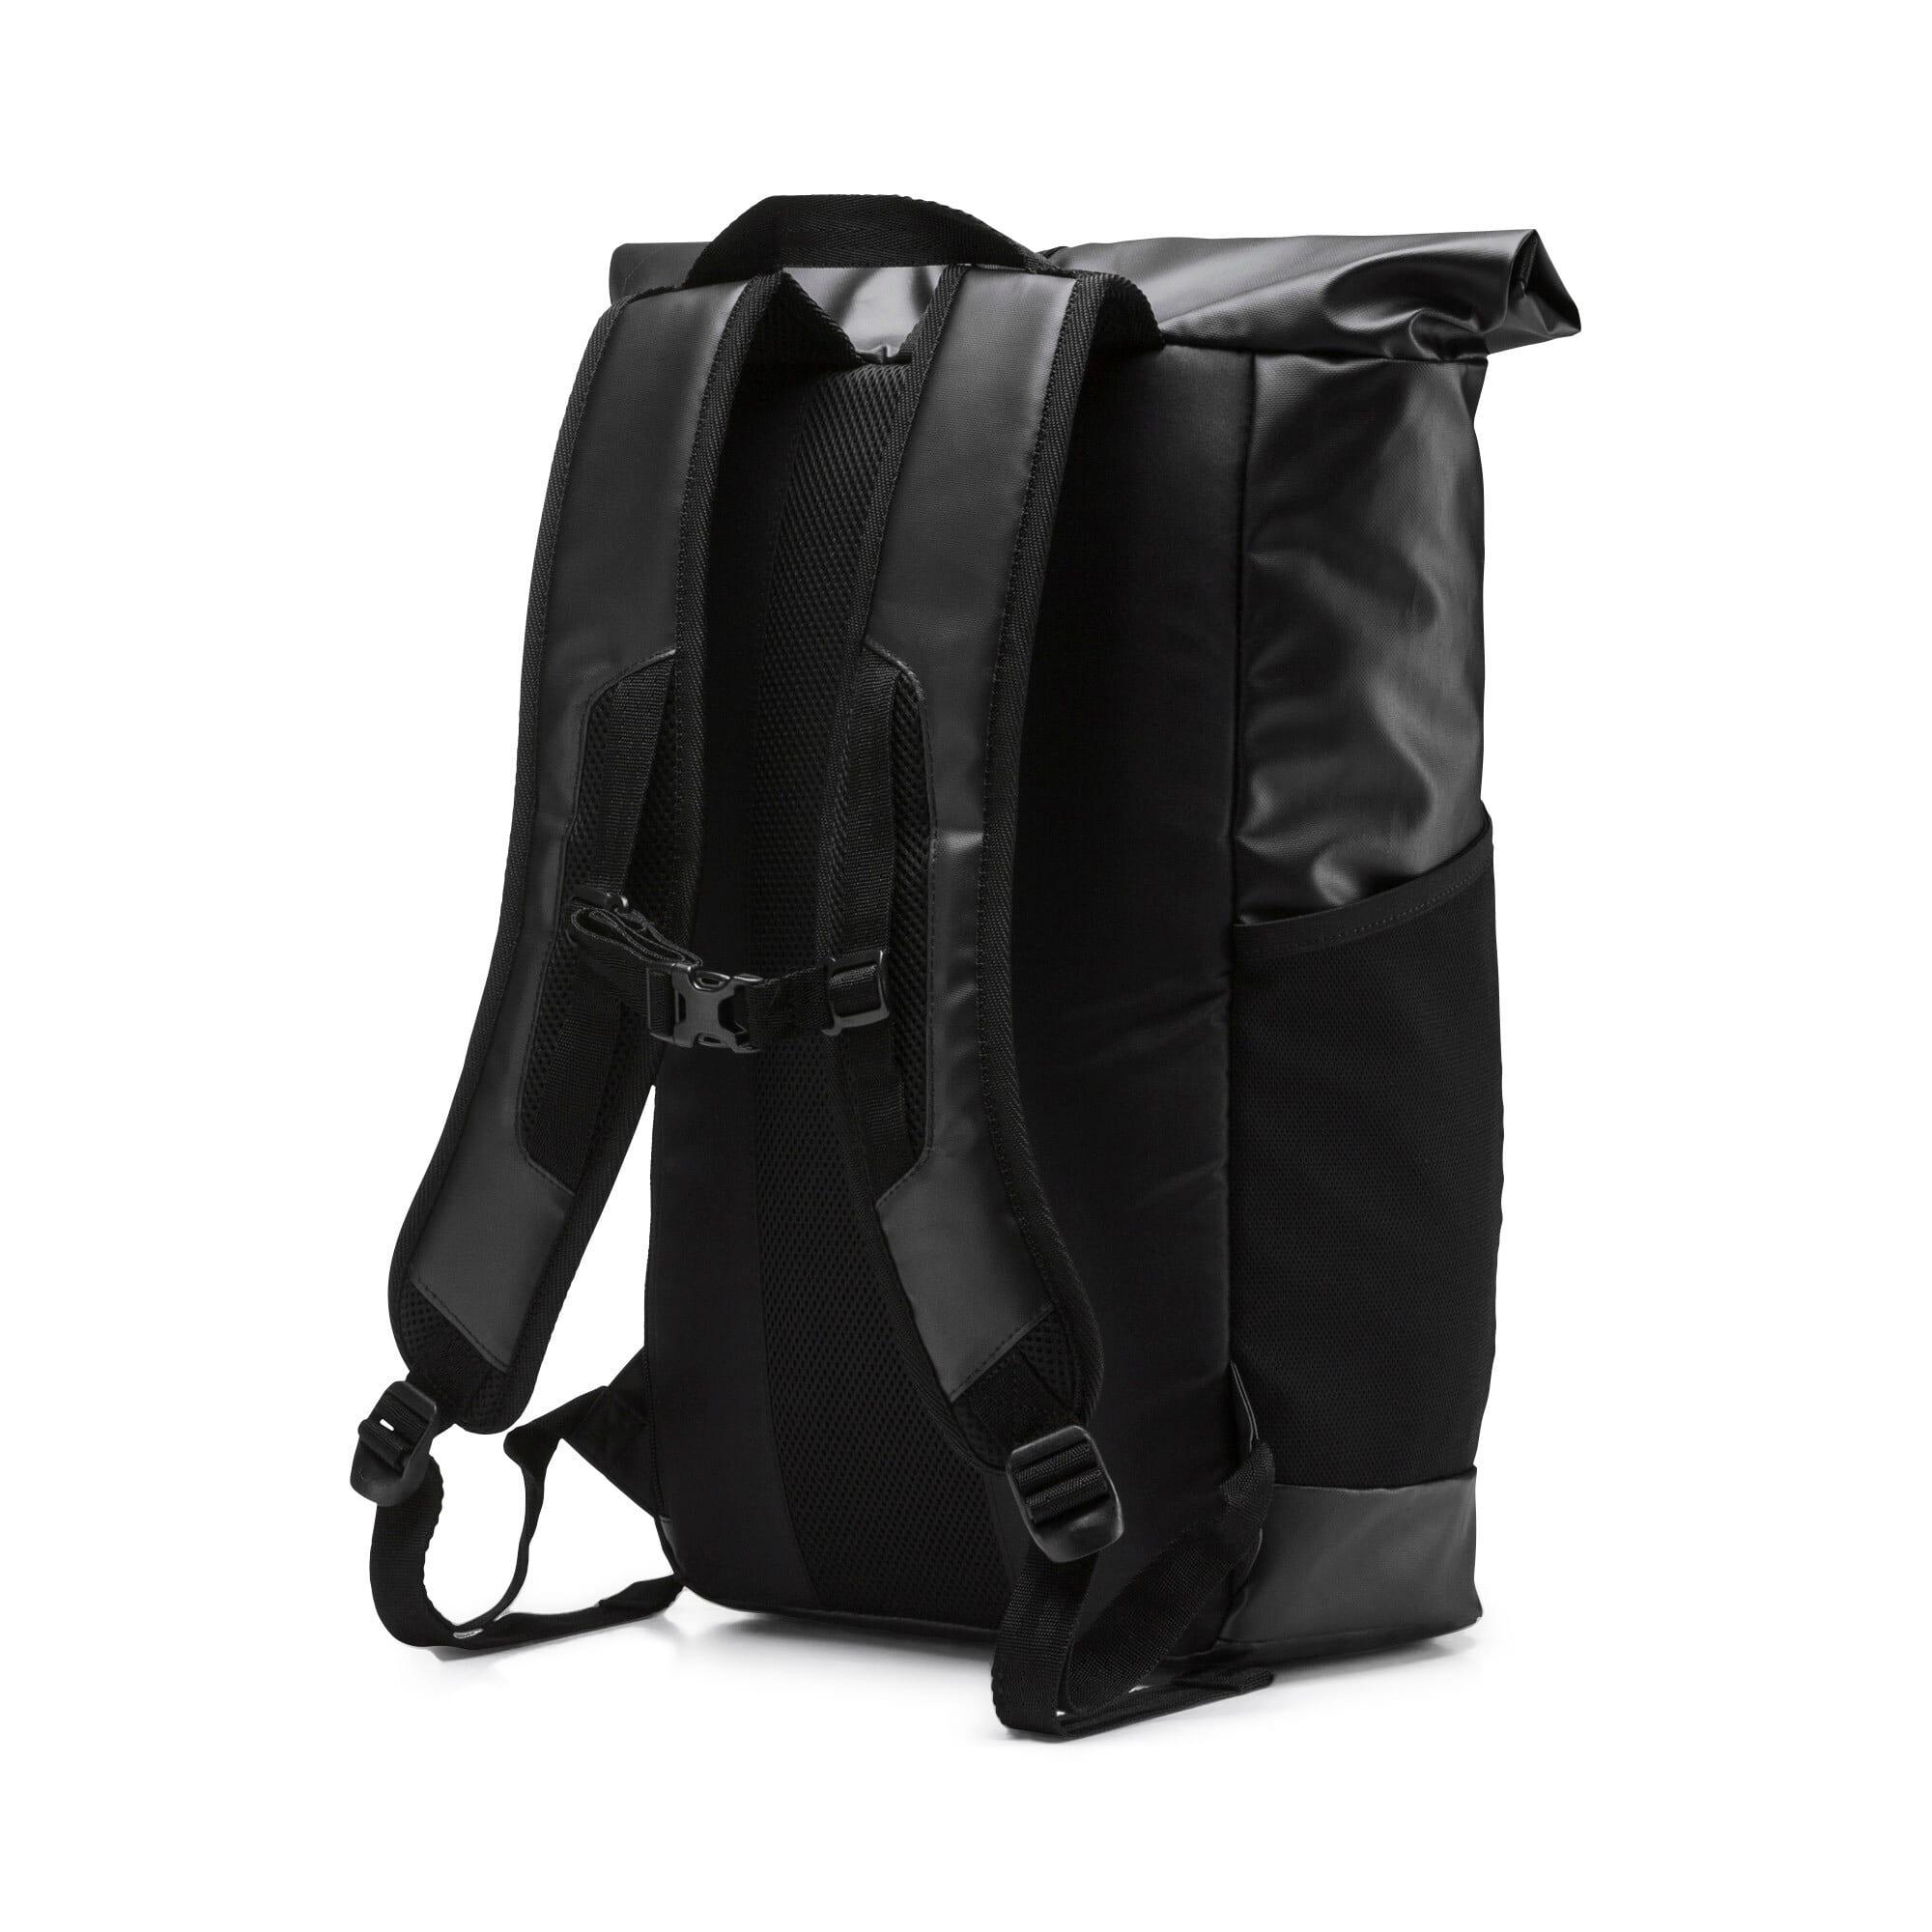 Thumbnail 3 of Energy Rolltop Backpack, Puma Black, medium